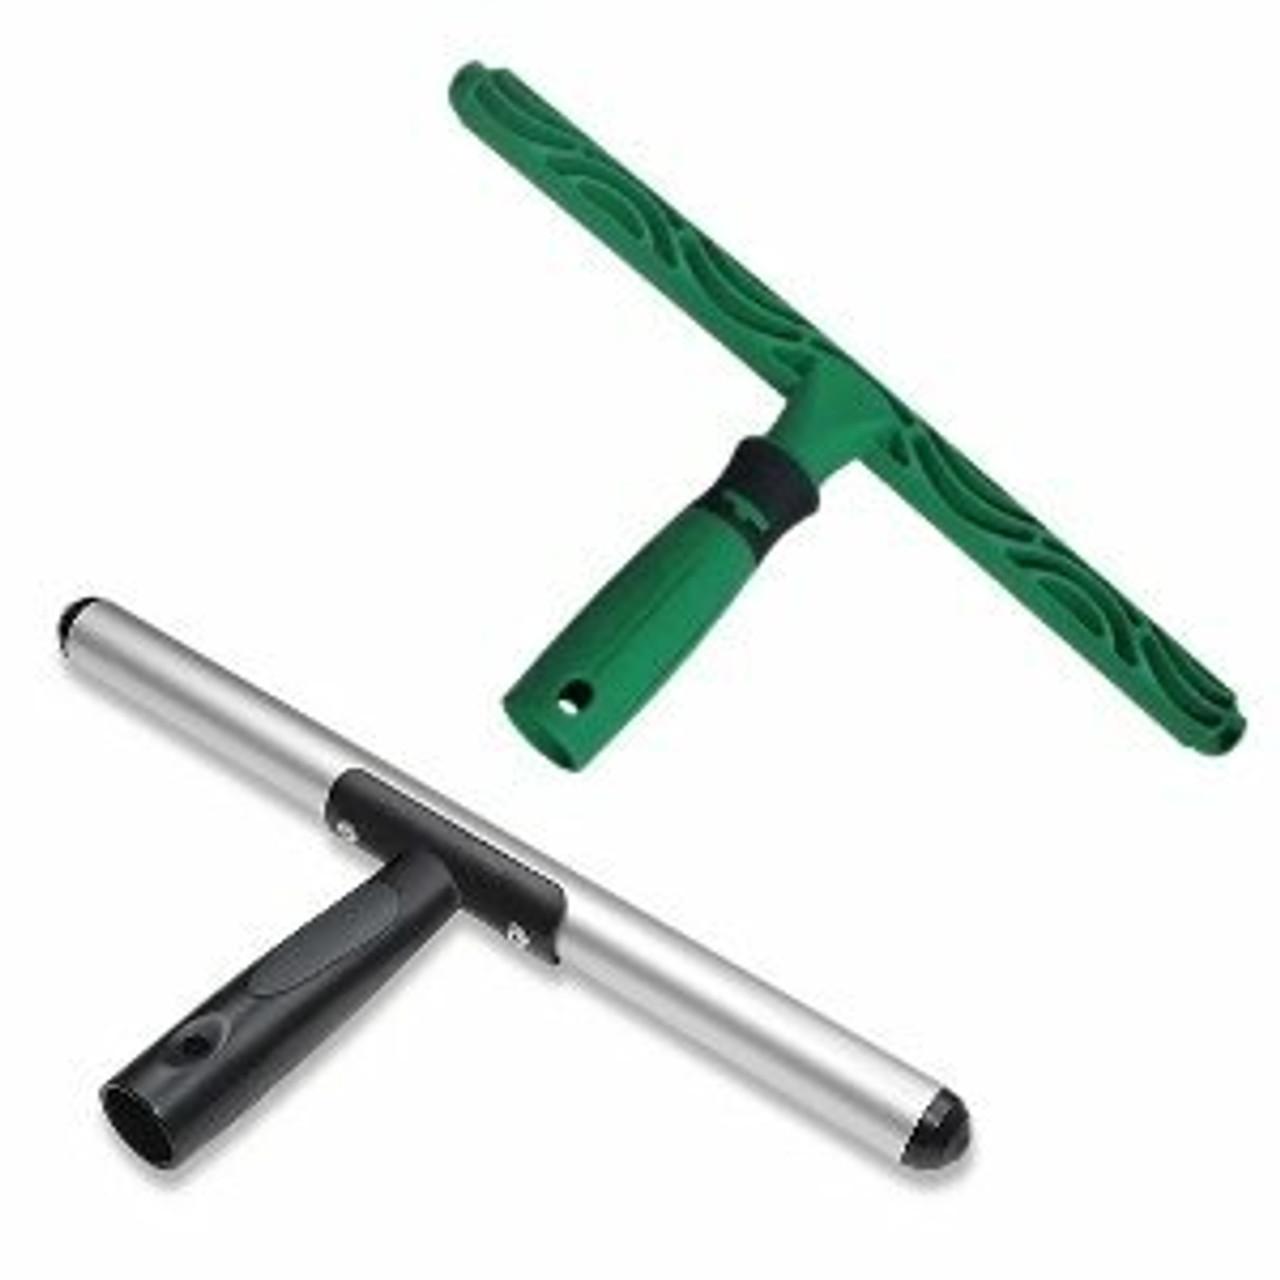 Sleeve/Washer T-Bars